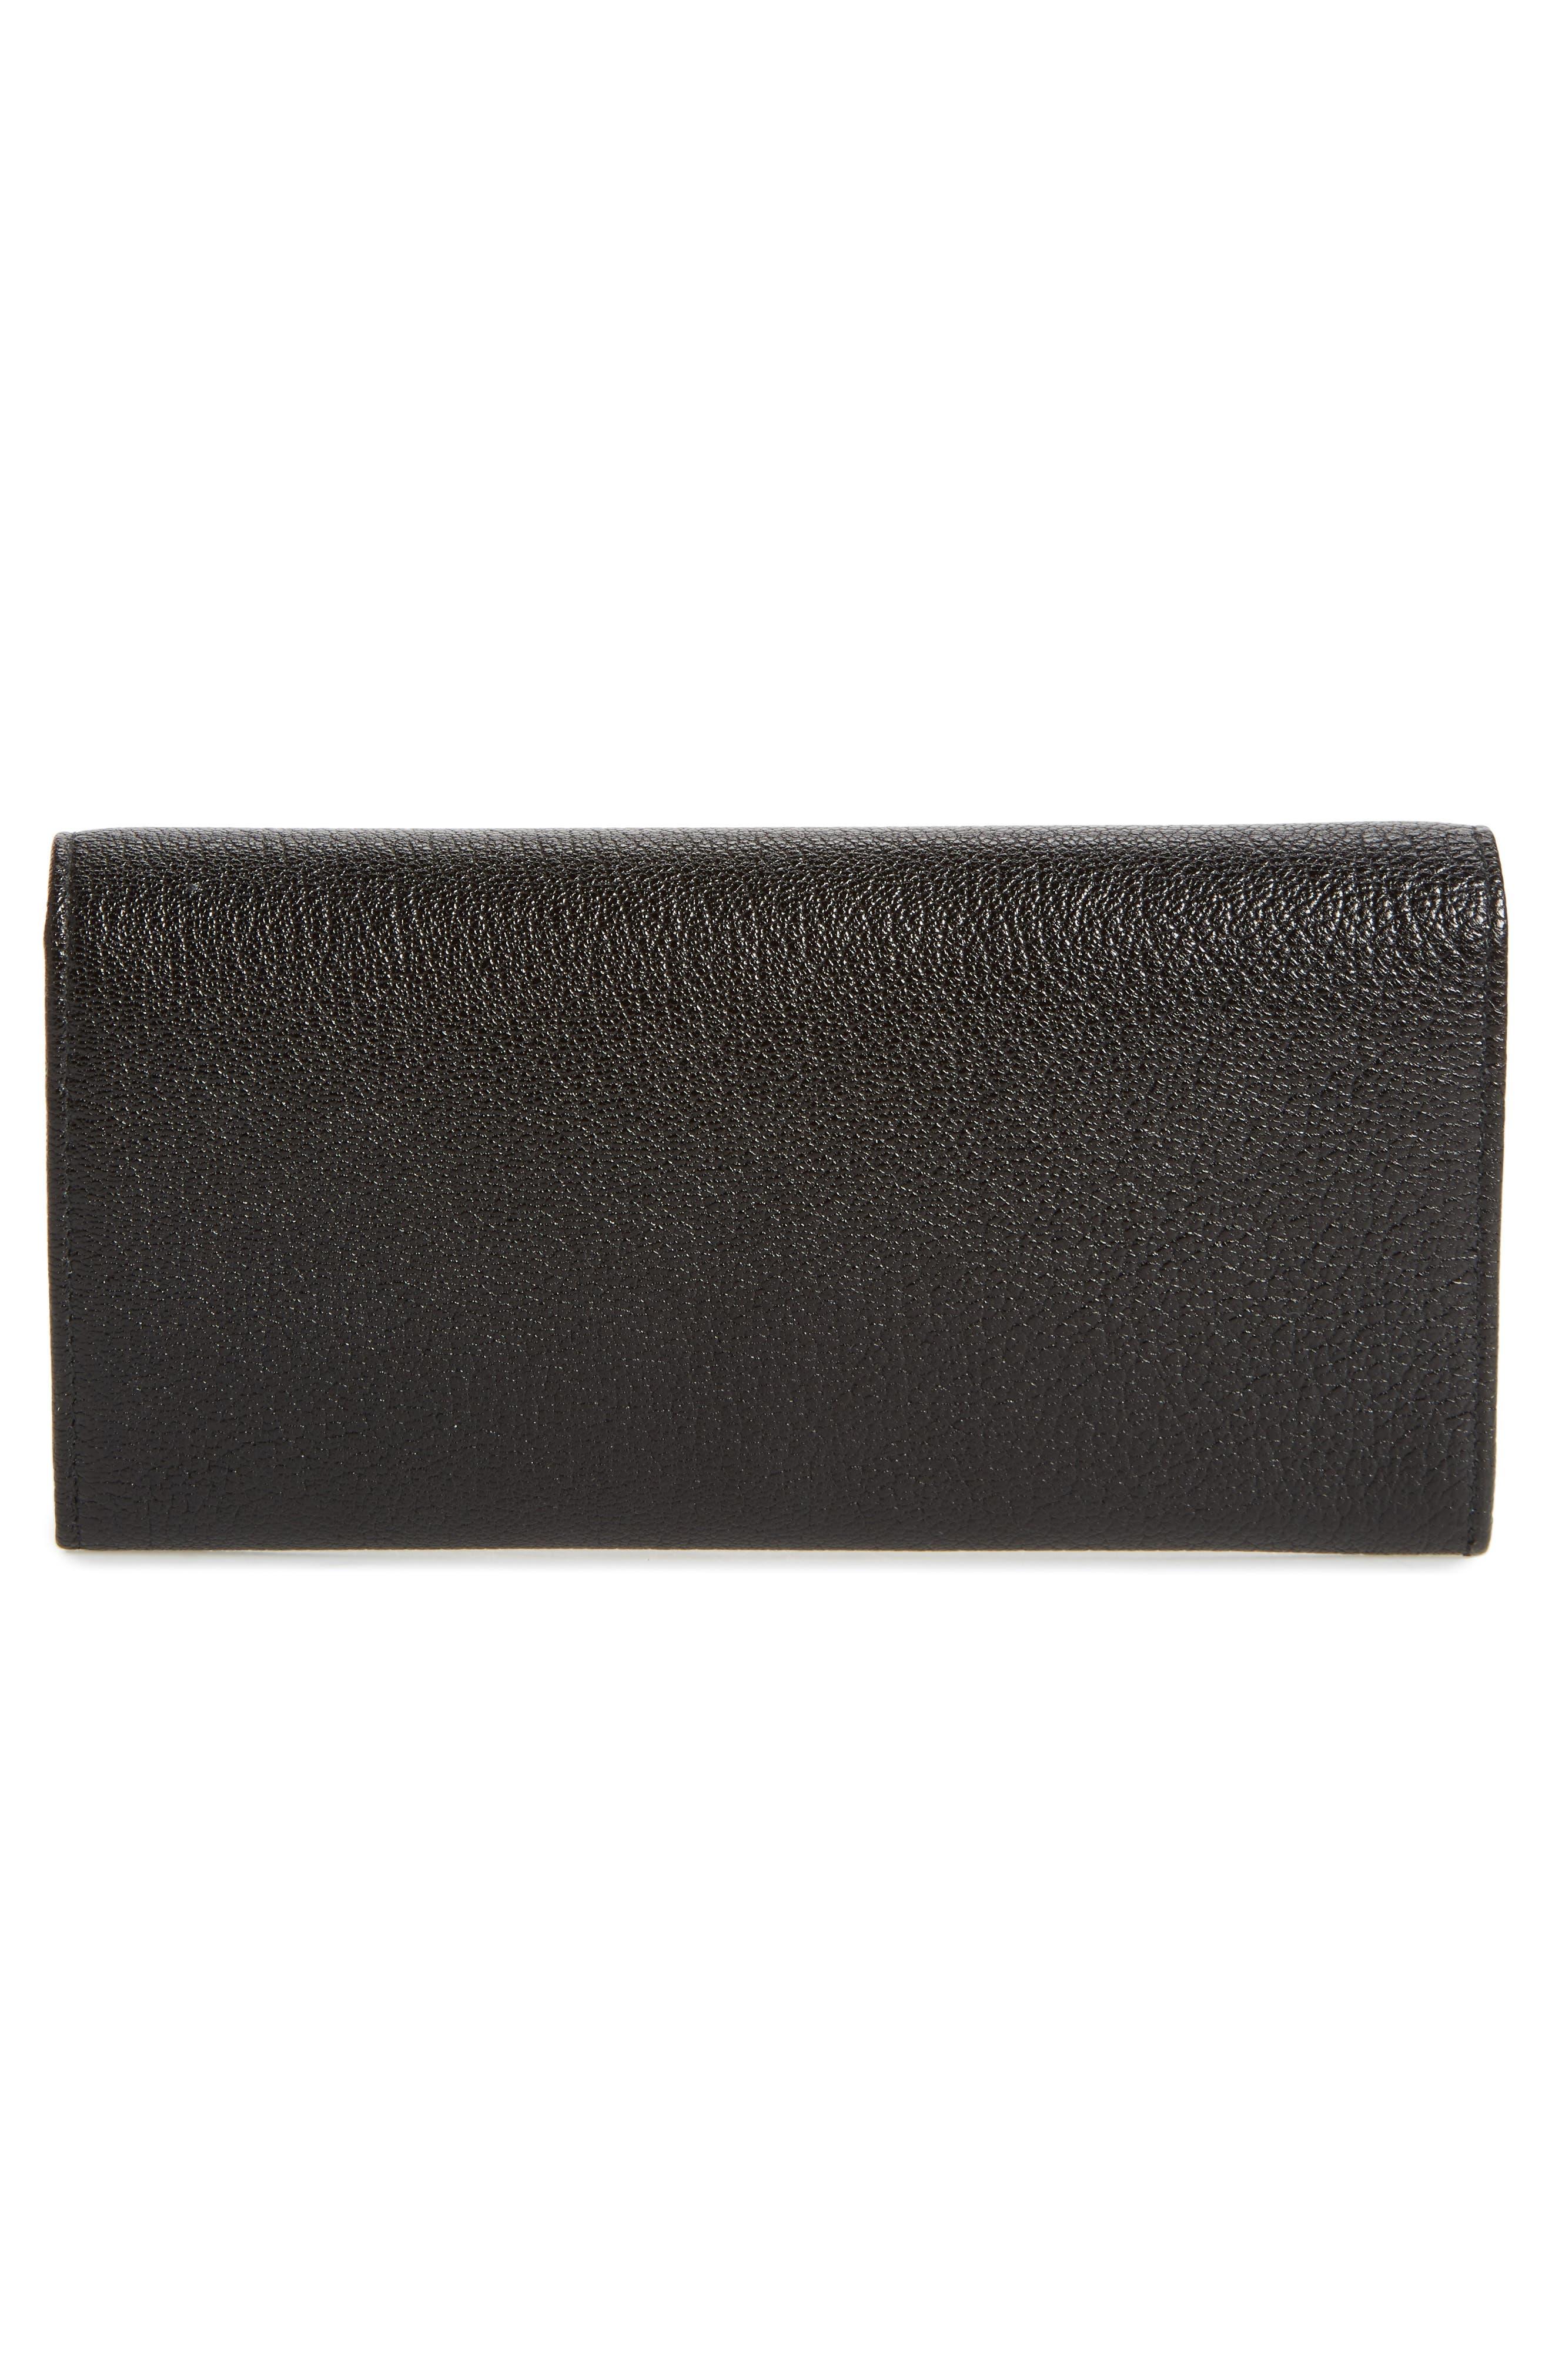 Metallic Edge Leather Wallet,                             Alternate thumbnail 4, color,                             Noir